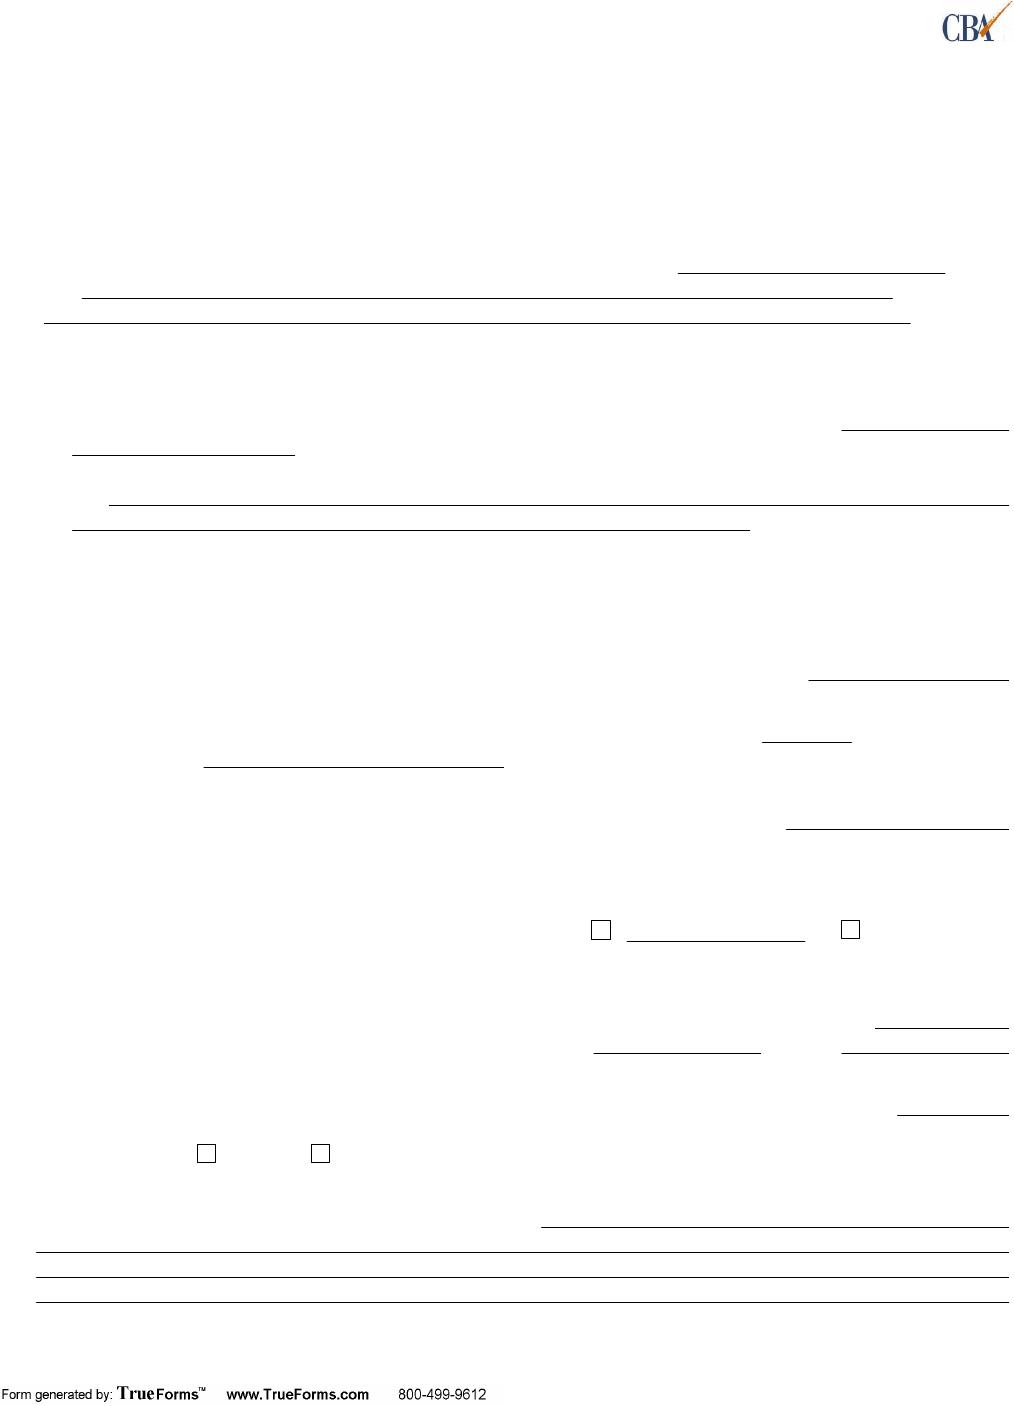 Washington Lease Agreement (Multi Tenant Triple Net(NNN)Lease) Form